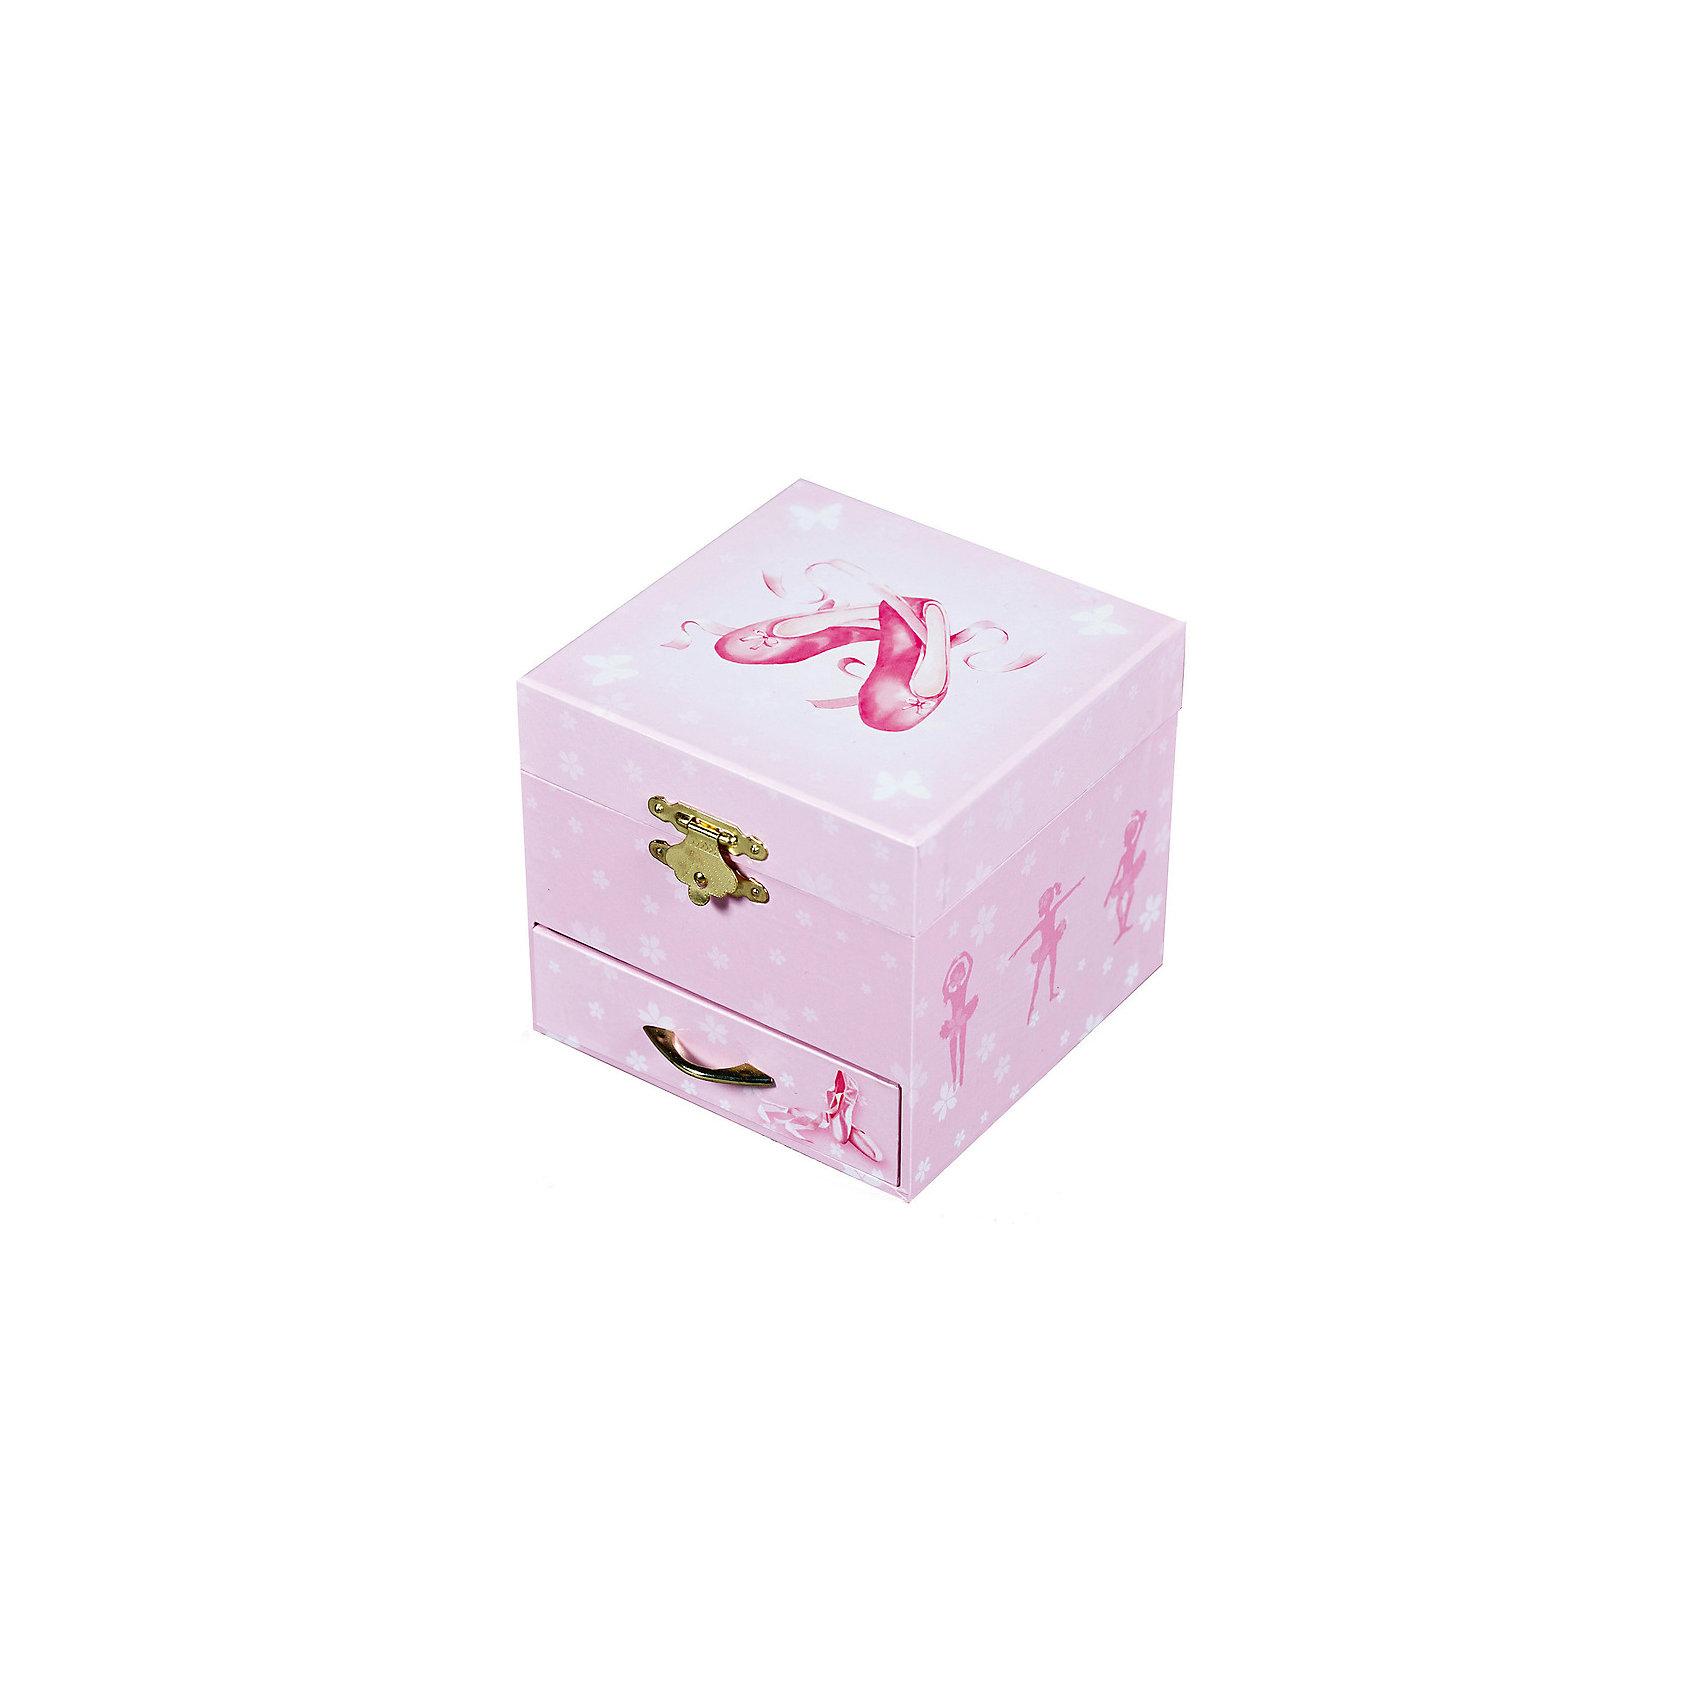 Музыкальная шкатулка Ballerina Shoes - Figurine Ballerina, Trousselier, Pink